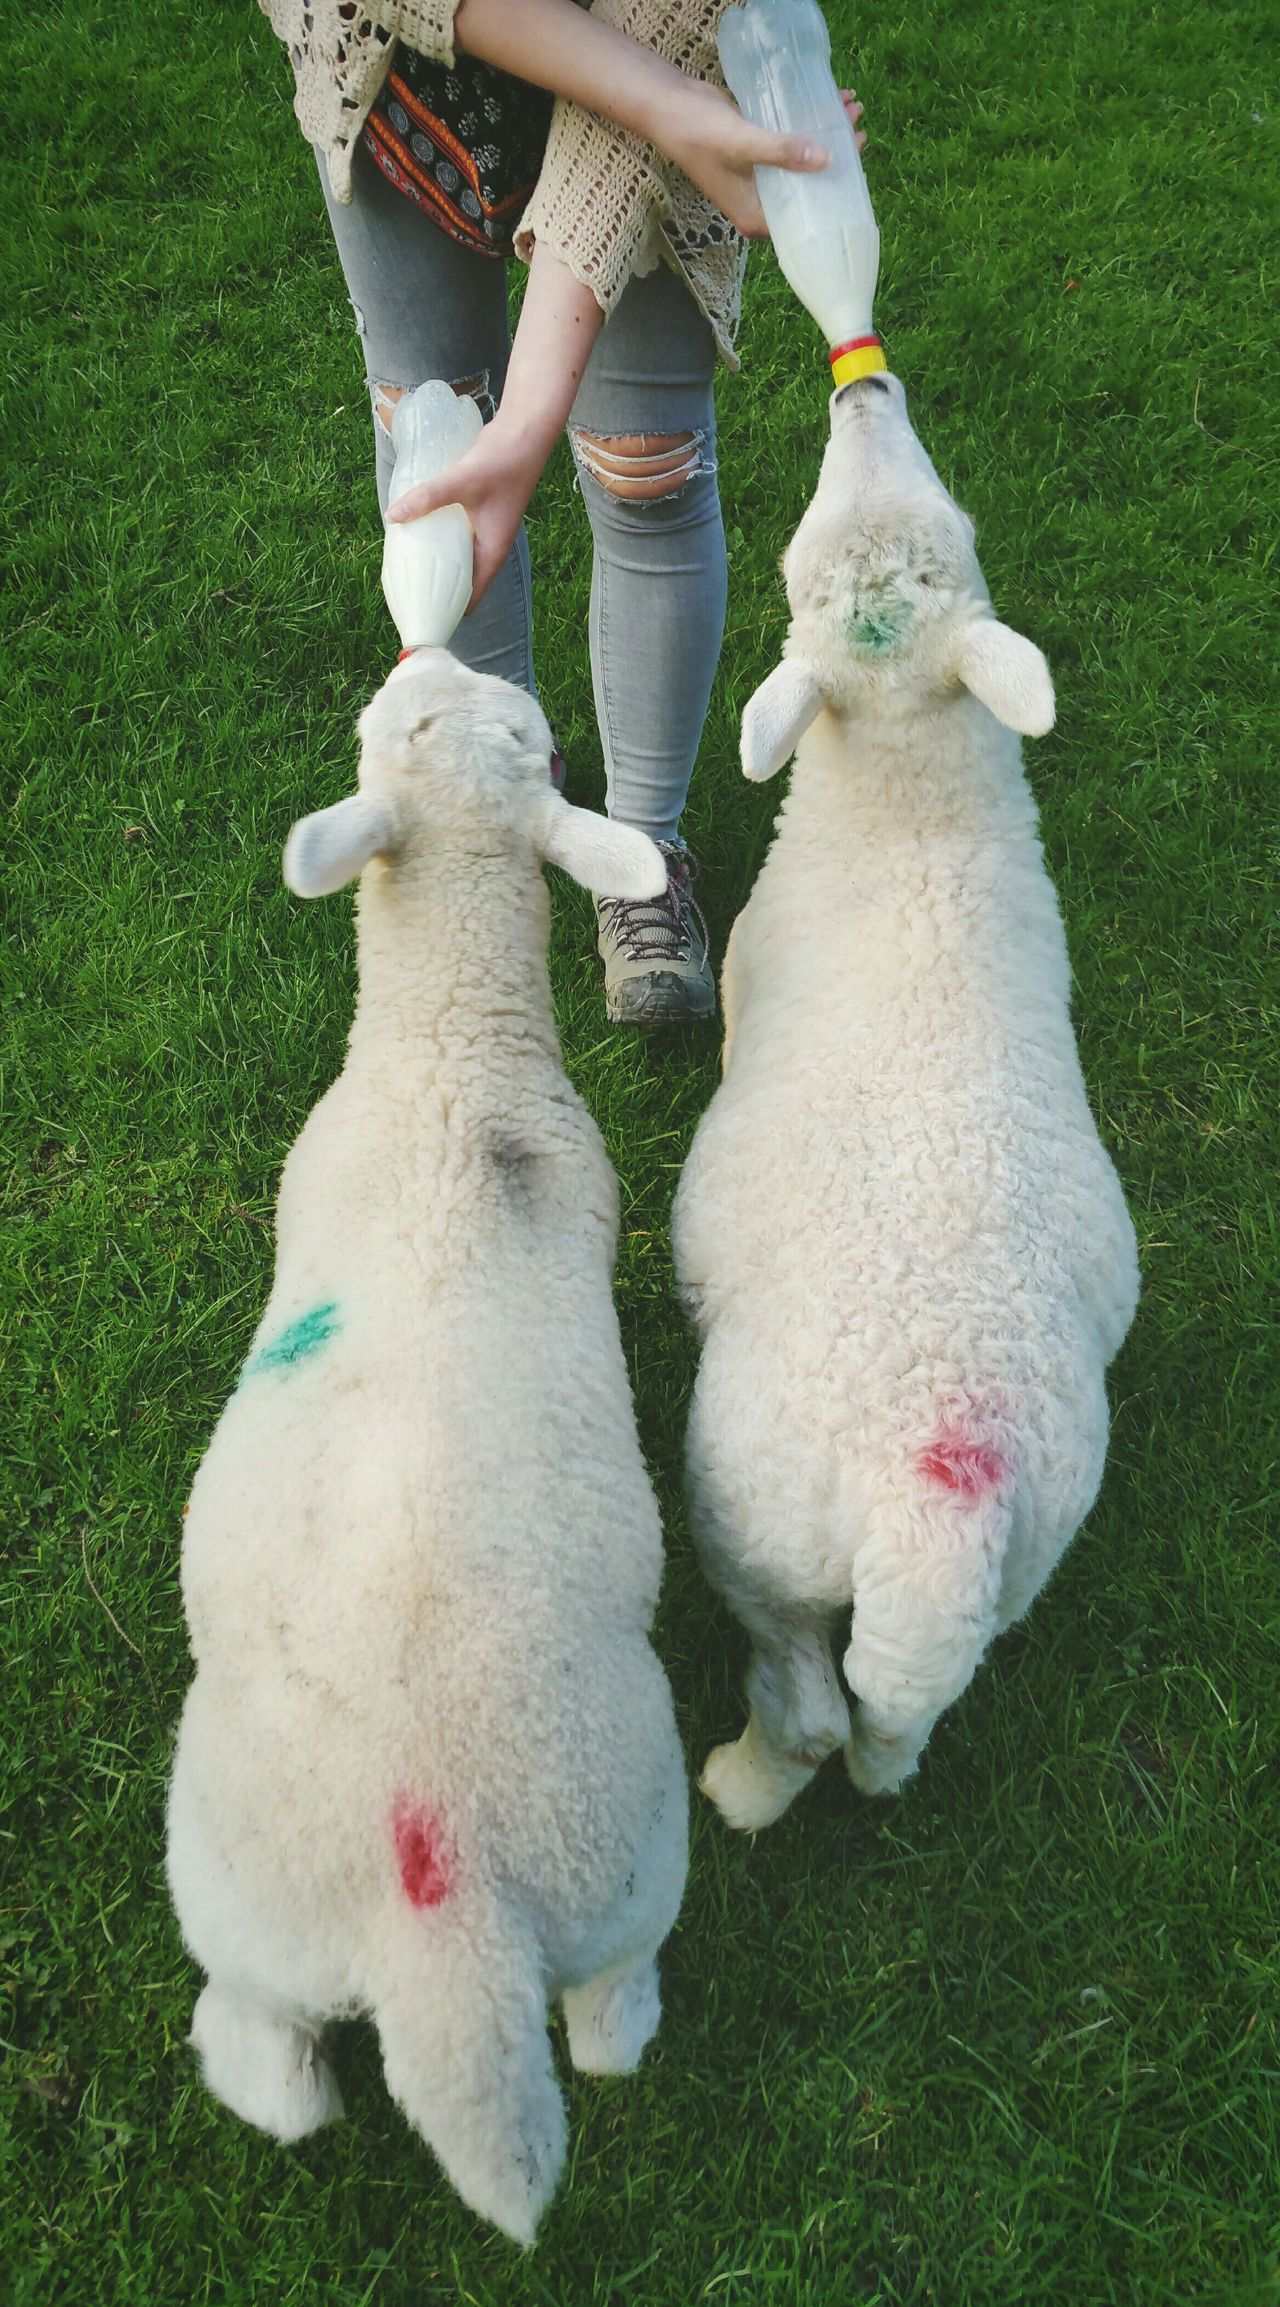 ... hungry Lambs ... Feeding Animals Sheep Farm Milk Baby Animals Wales Just Visiting Daughter Farmlife Rural Scene барашки ягнята овечки Ovelhas Ovelles Ovelhinhas